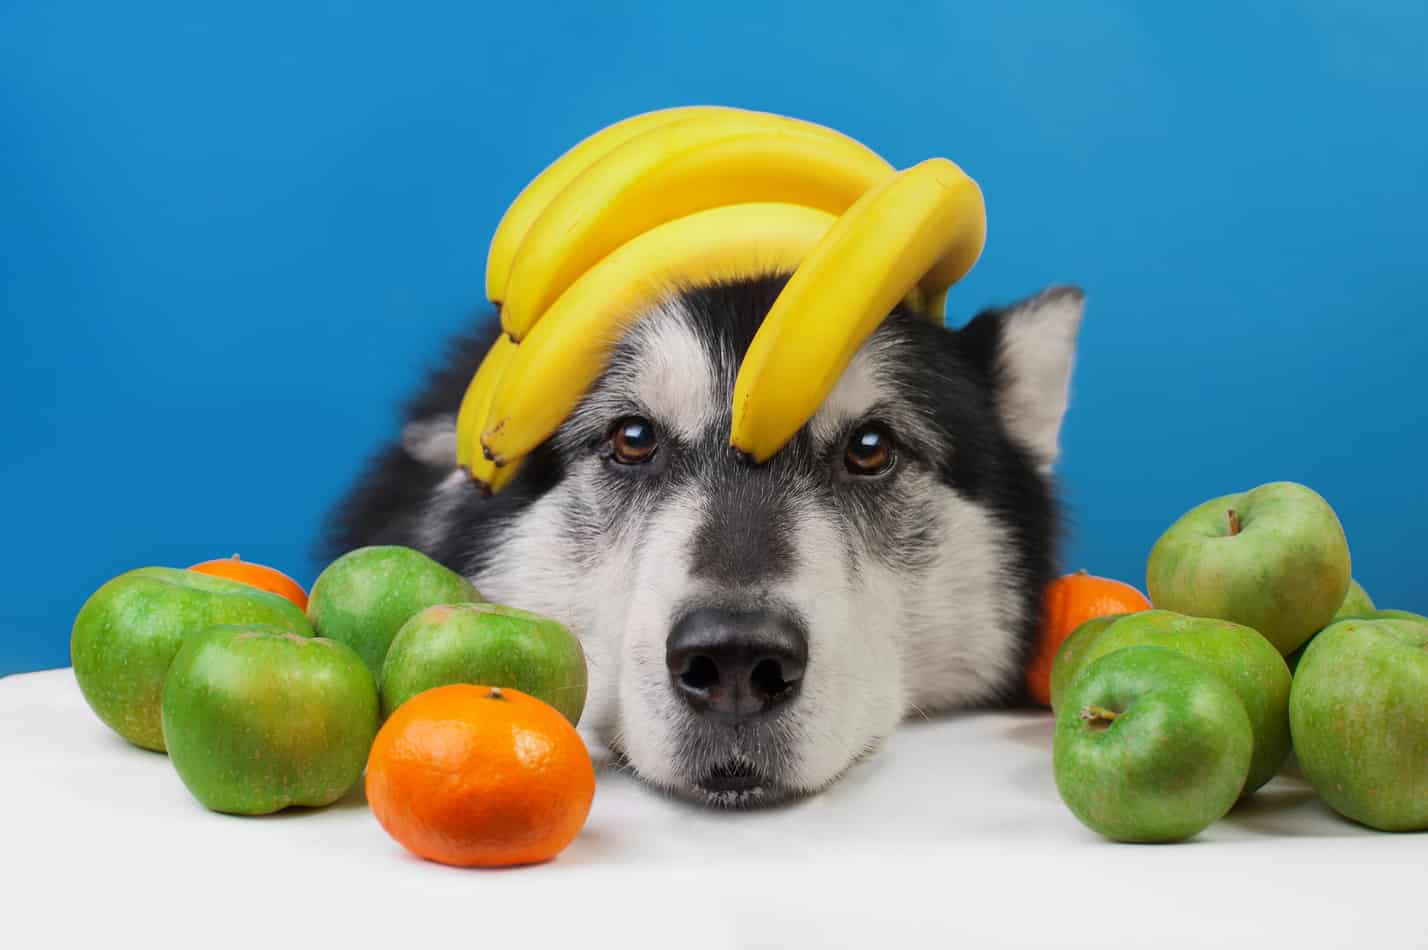 Can Huskies Eat Bananas?